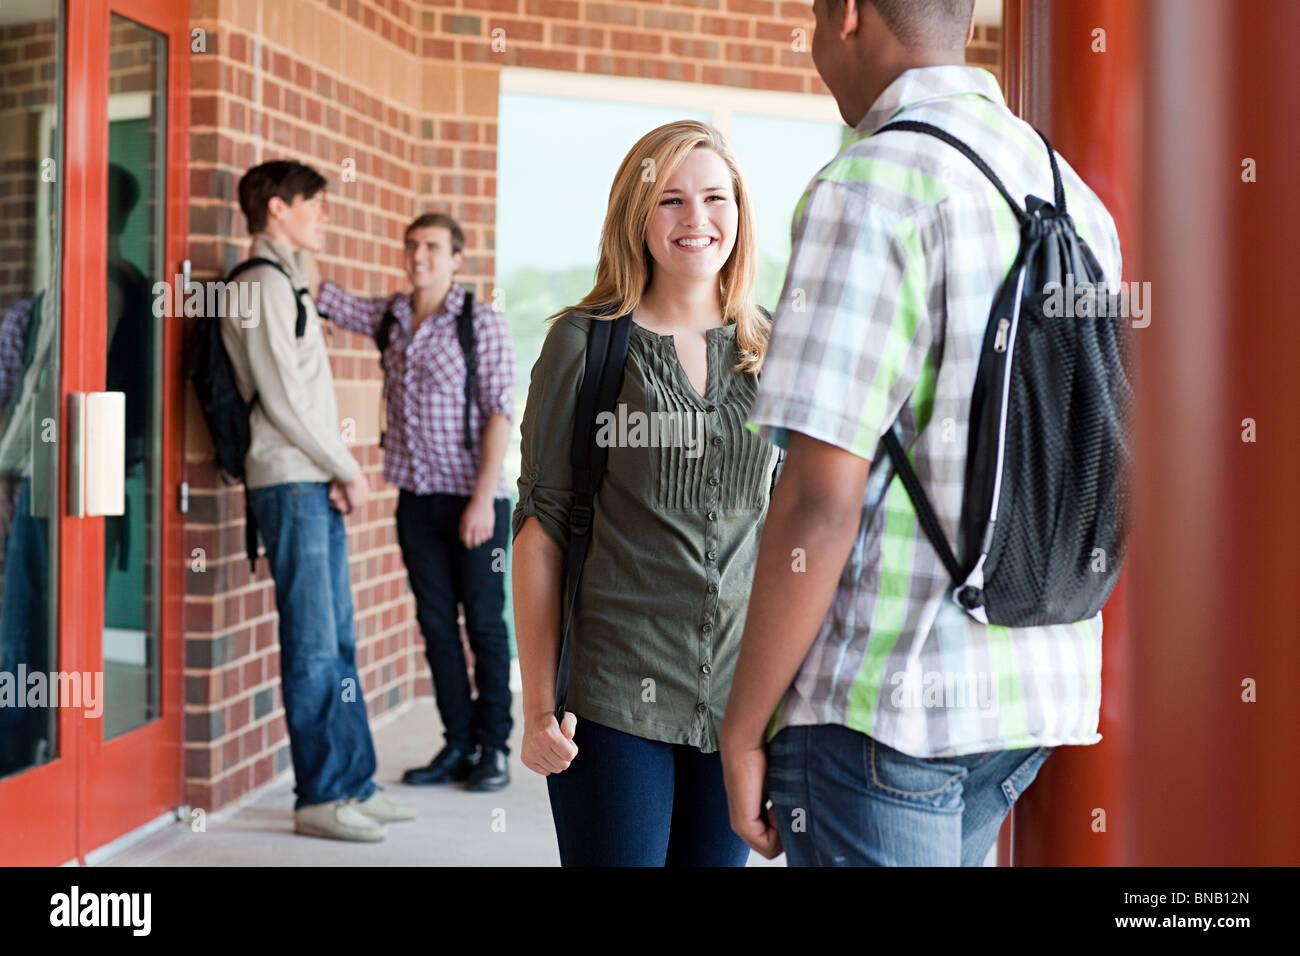 High school classmates chatting - Stock Image